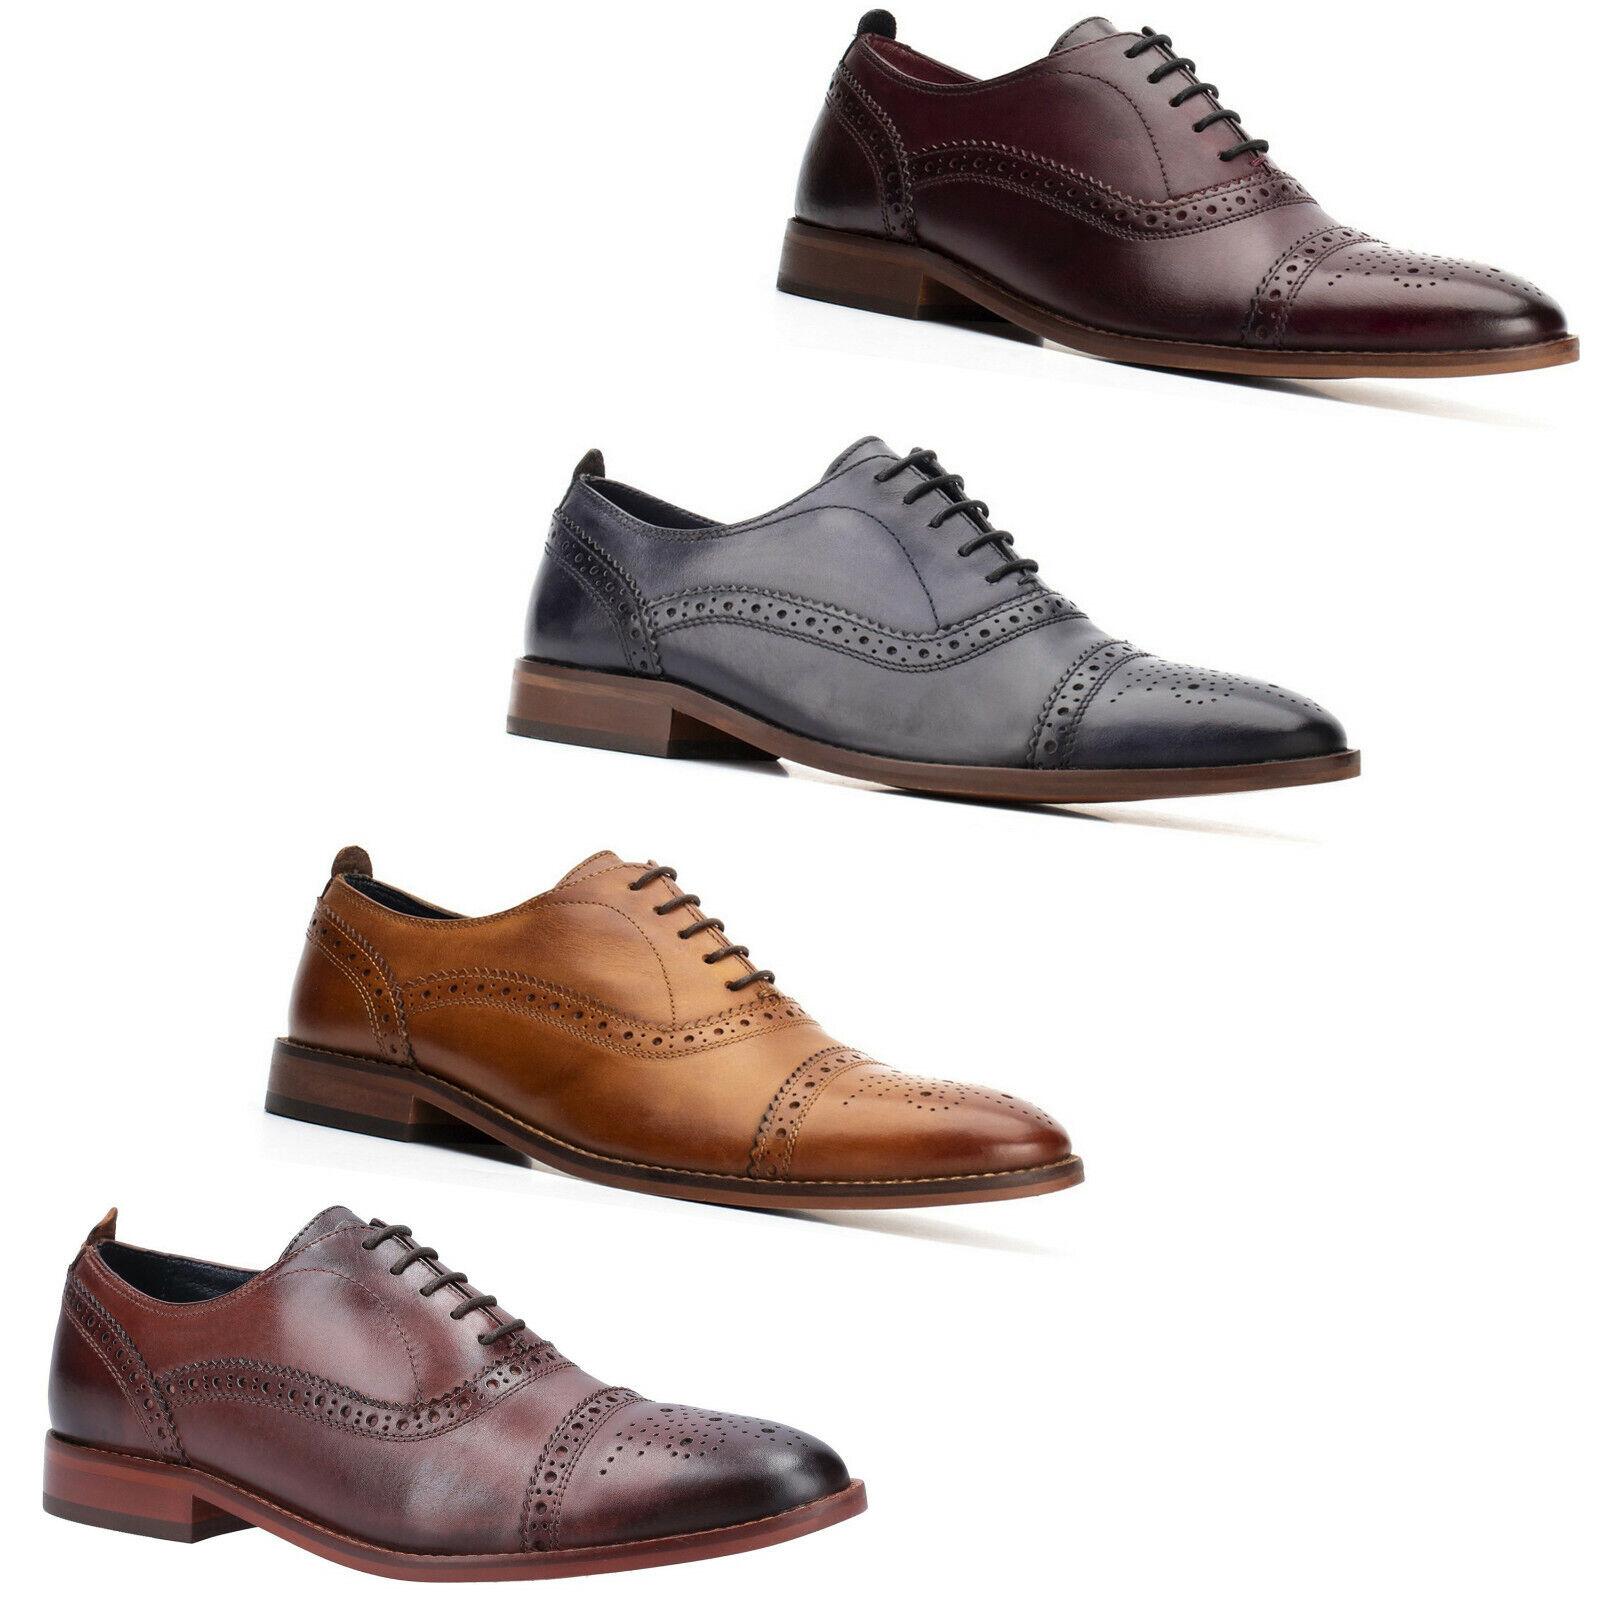 Base London Brogue Herren Oxford Schuhe Leder Gegossen Gewaschen Formelle Ups